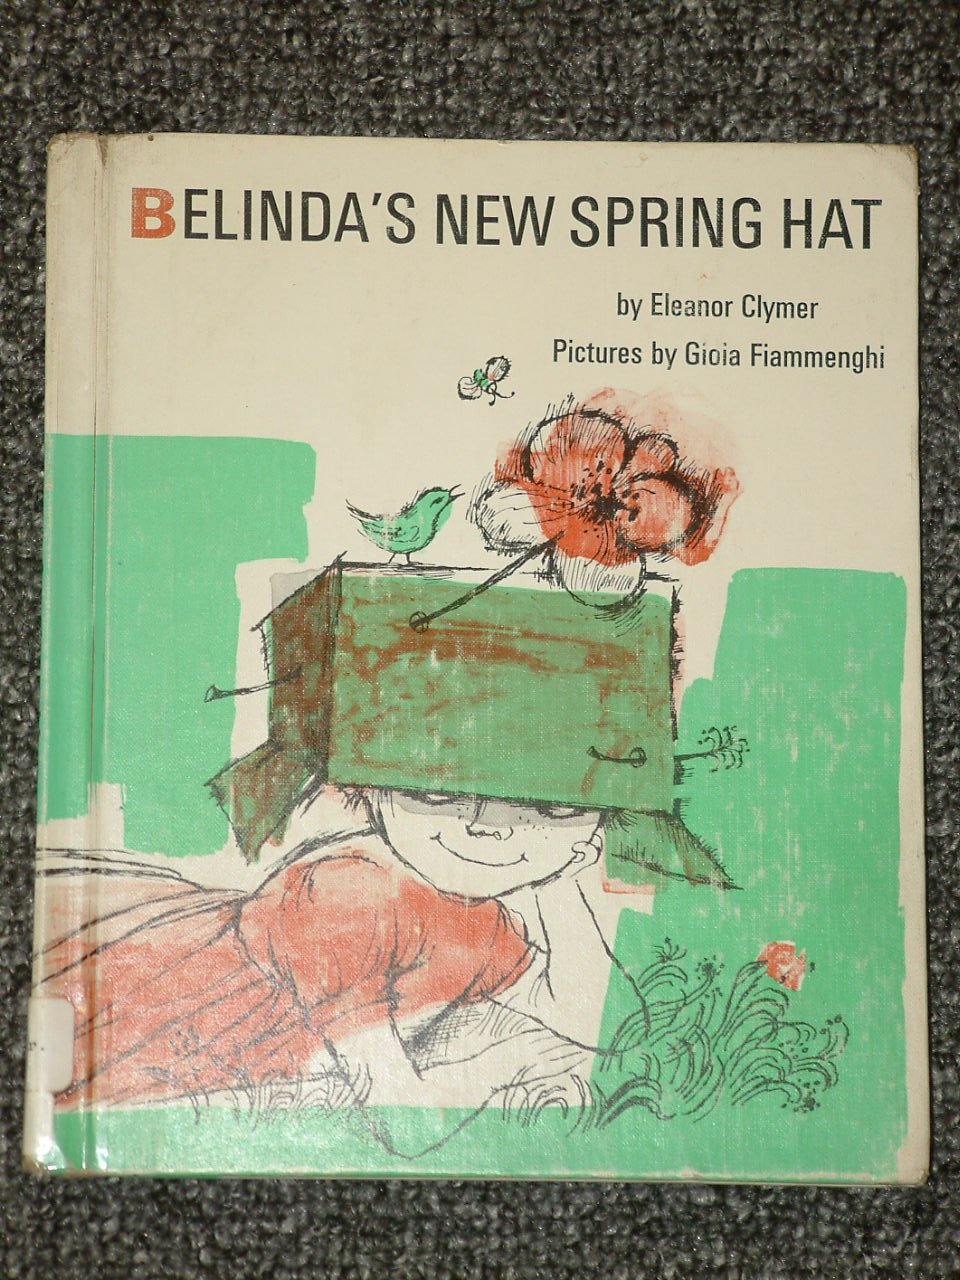 Belinda's New Spring Hat by Eleanor Clymer 1969